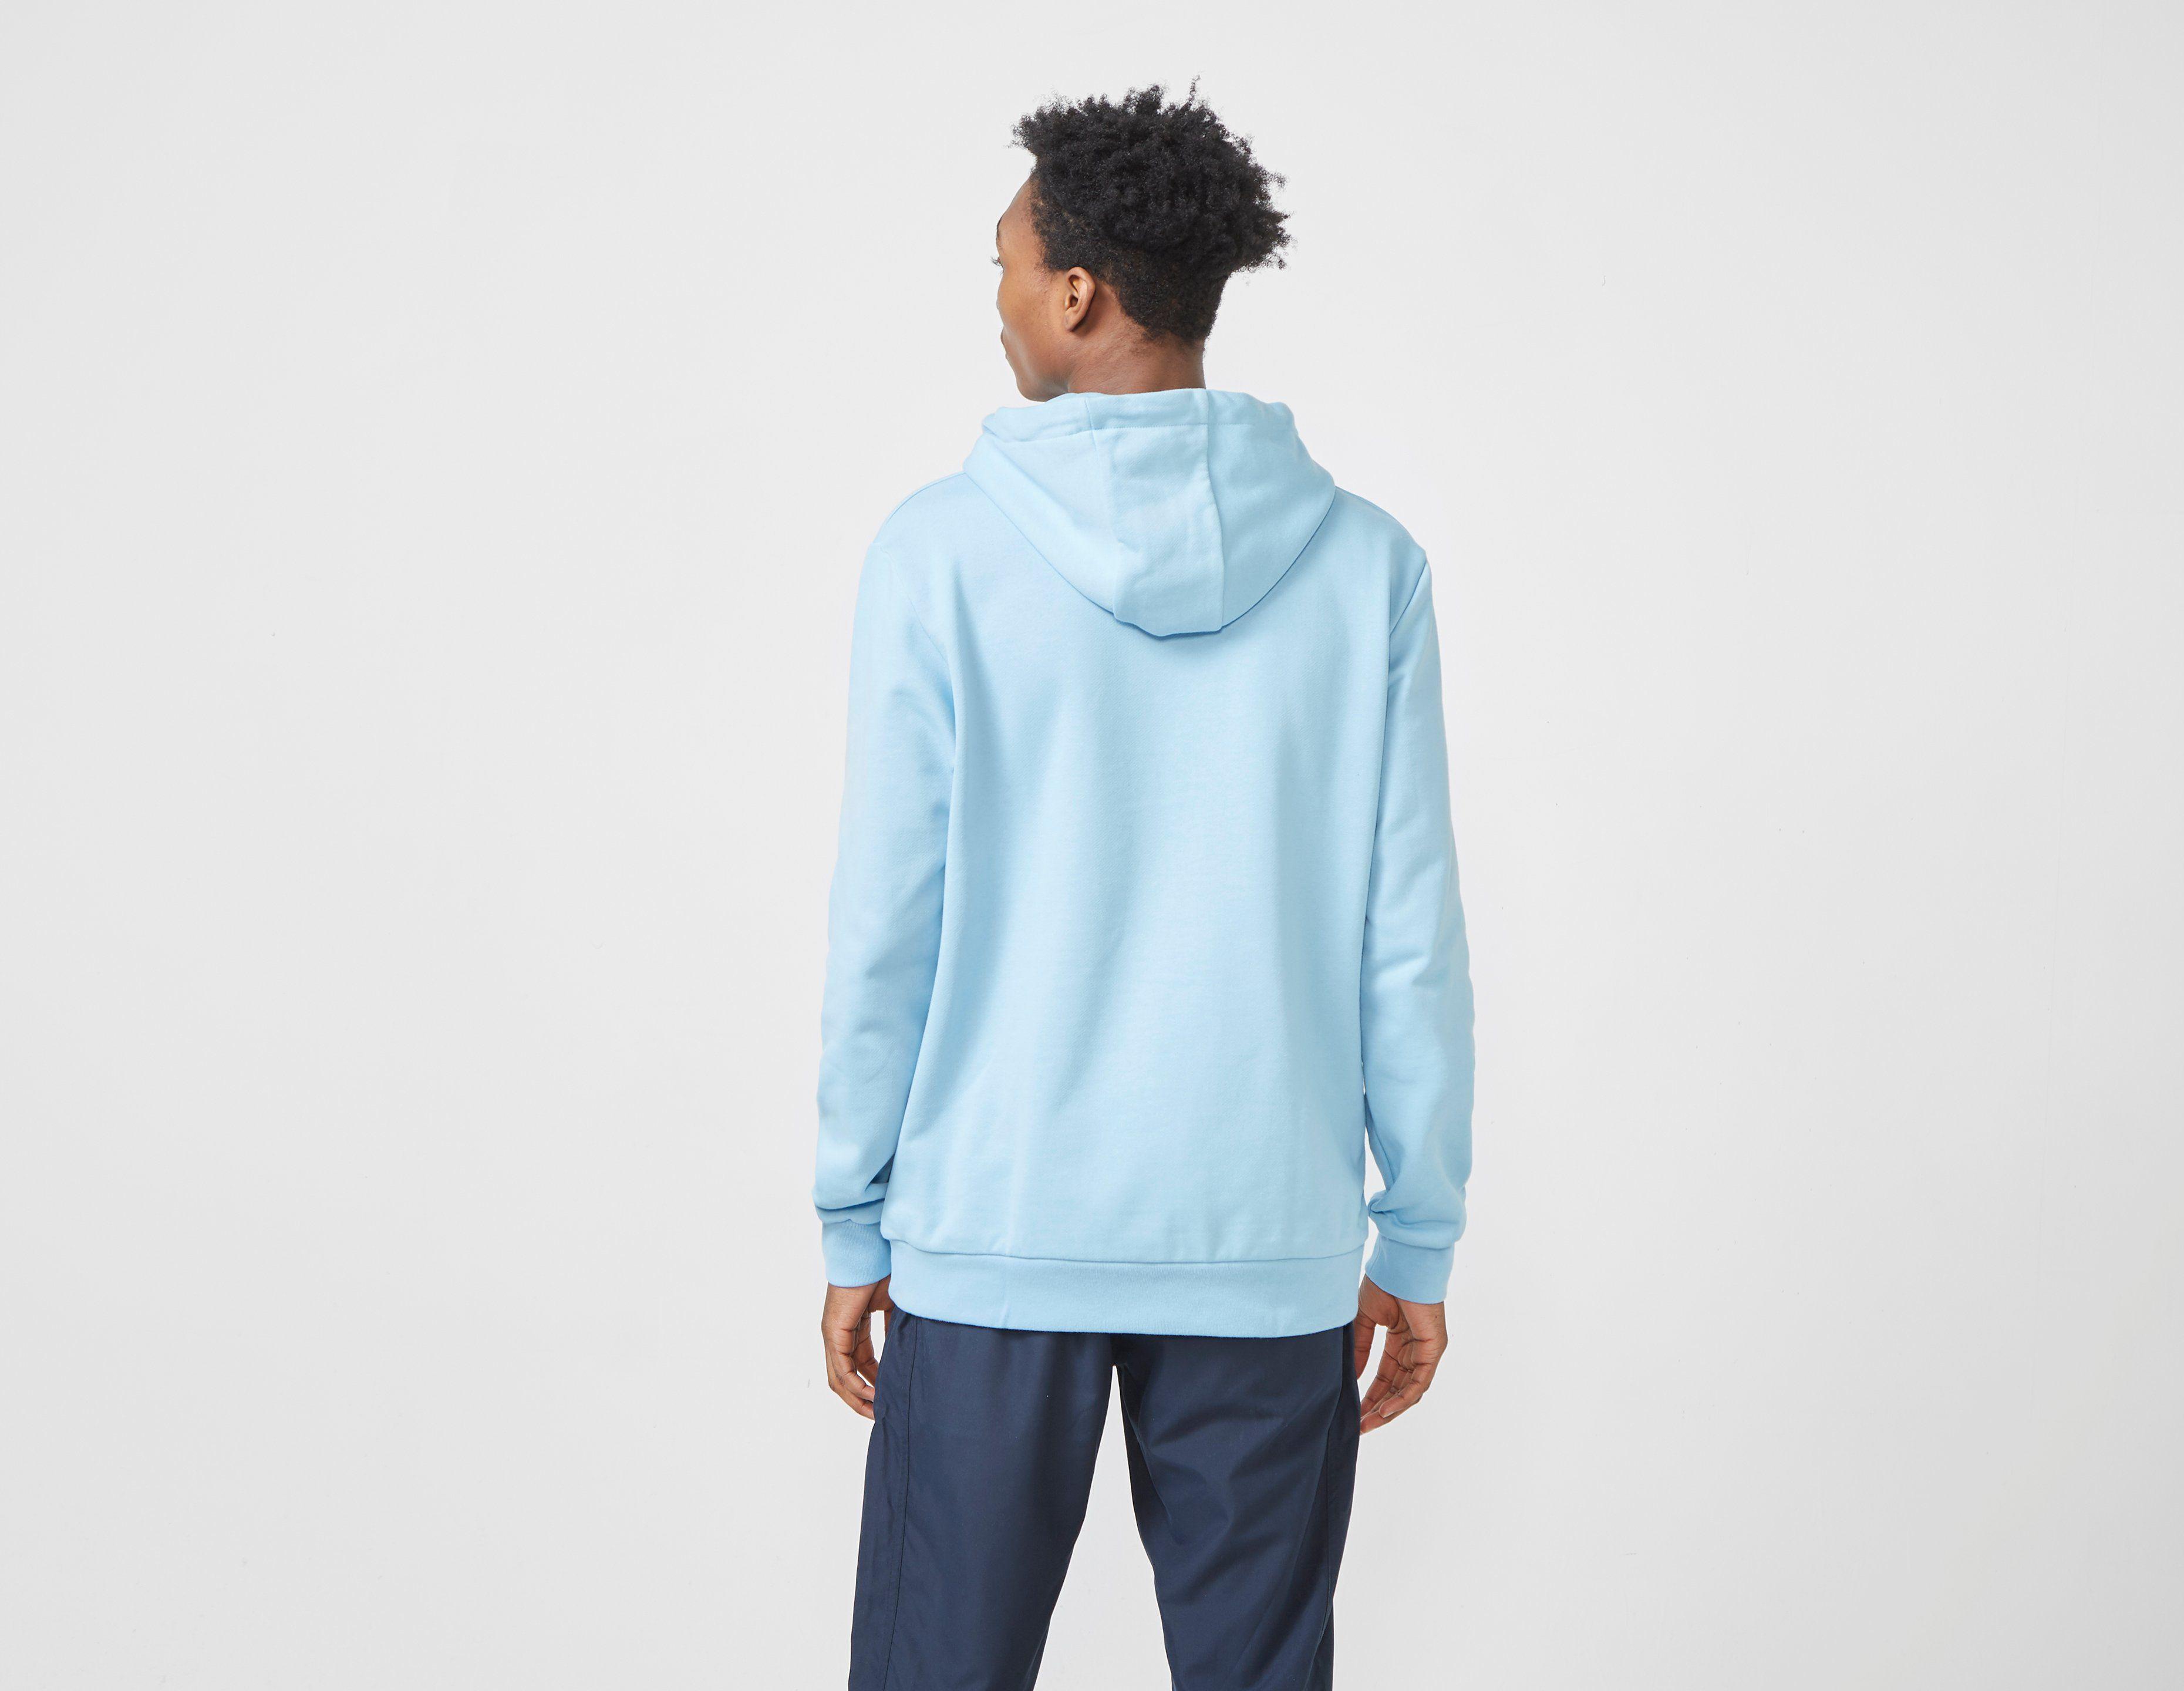 adidas SPEZIAL Banktop Pullover Hoodie